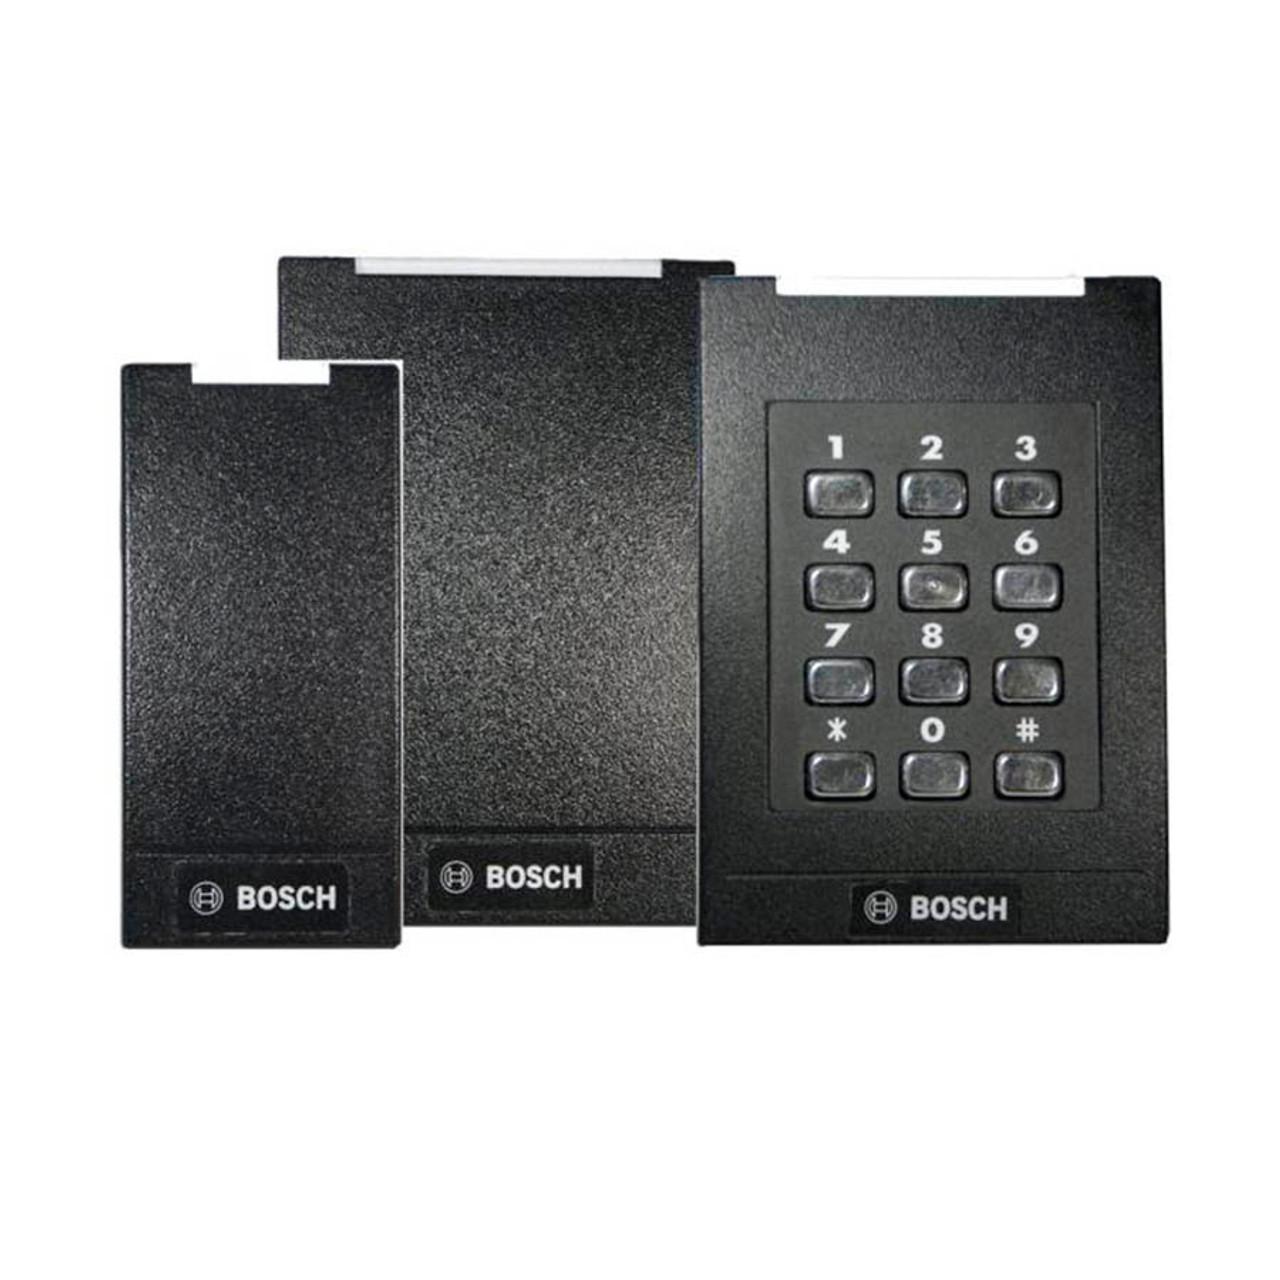 Bosch ARD-SER10-WI iCLASS/MIFARE RFID Proximity Card Reader - Wiegand,  13 56 MHz